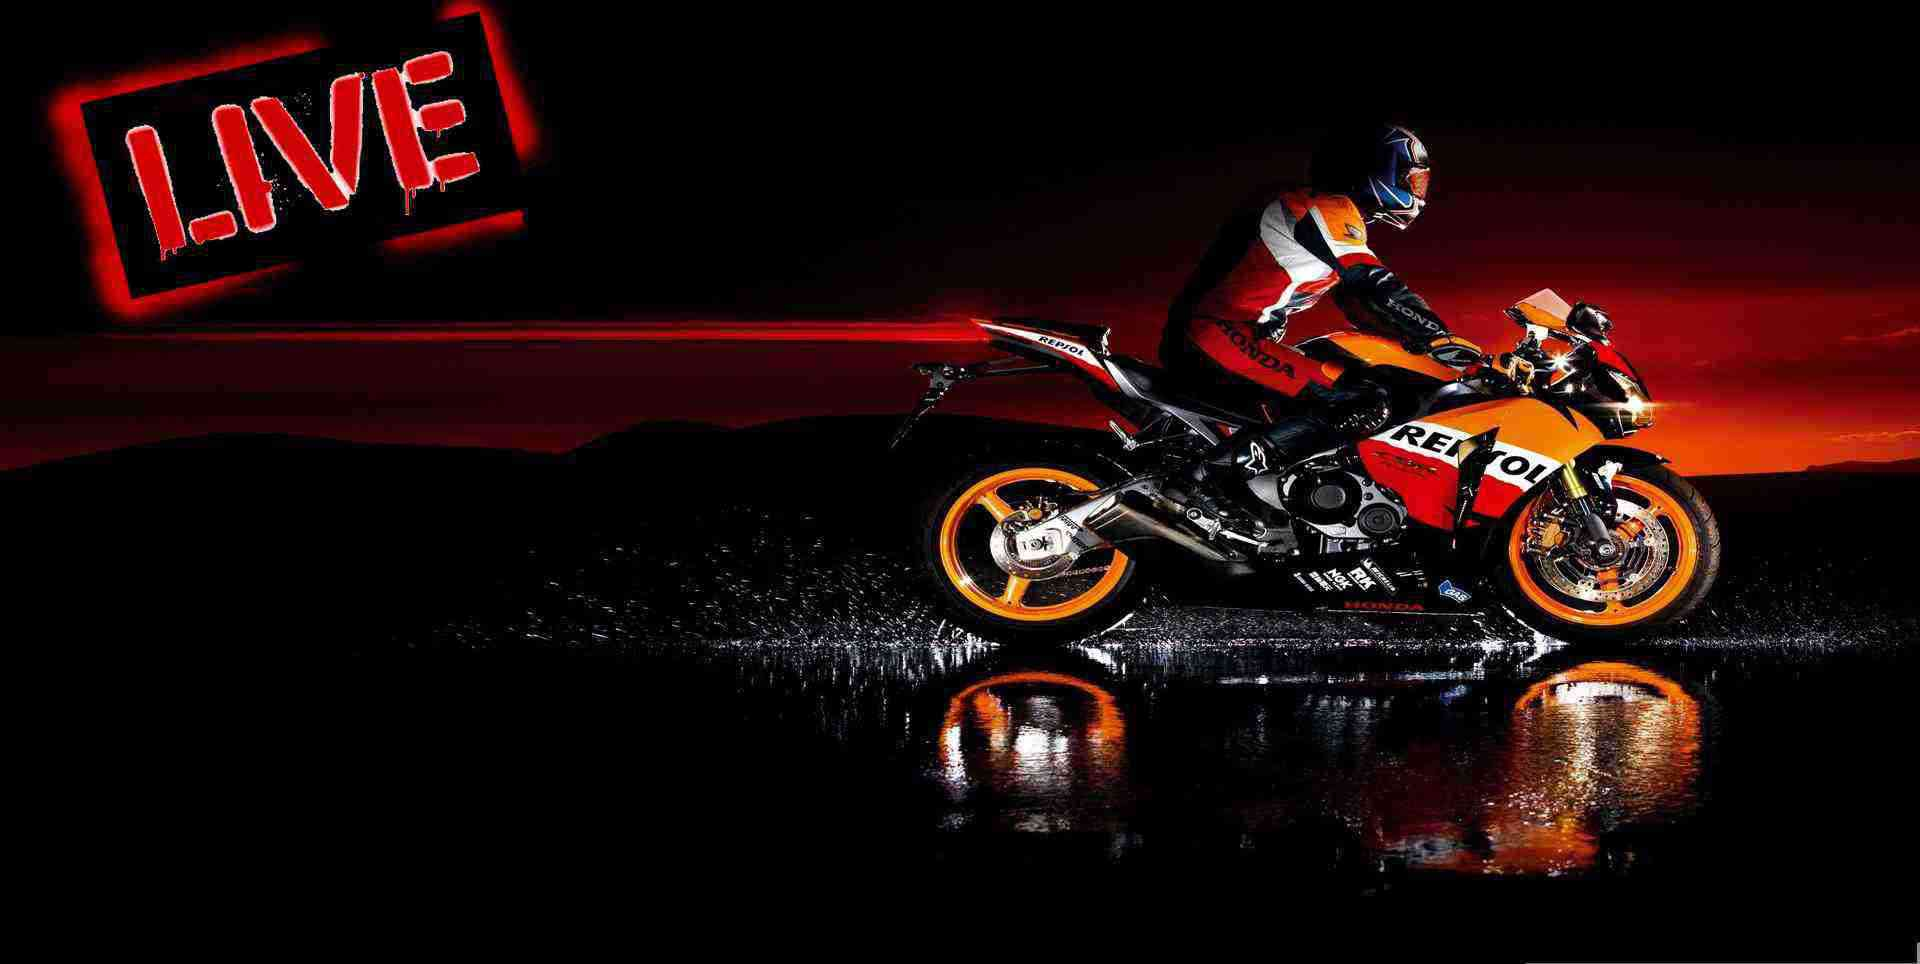 motogp-race-japan-2015-online